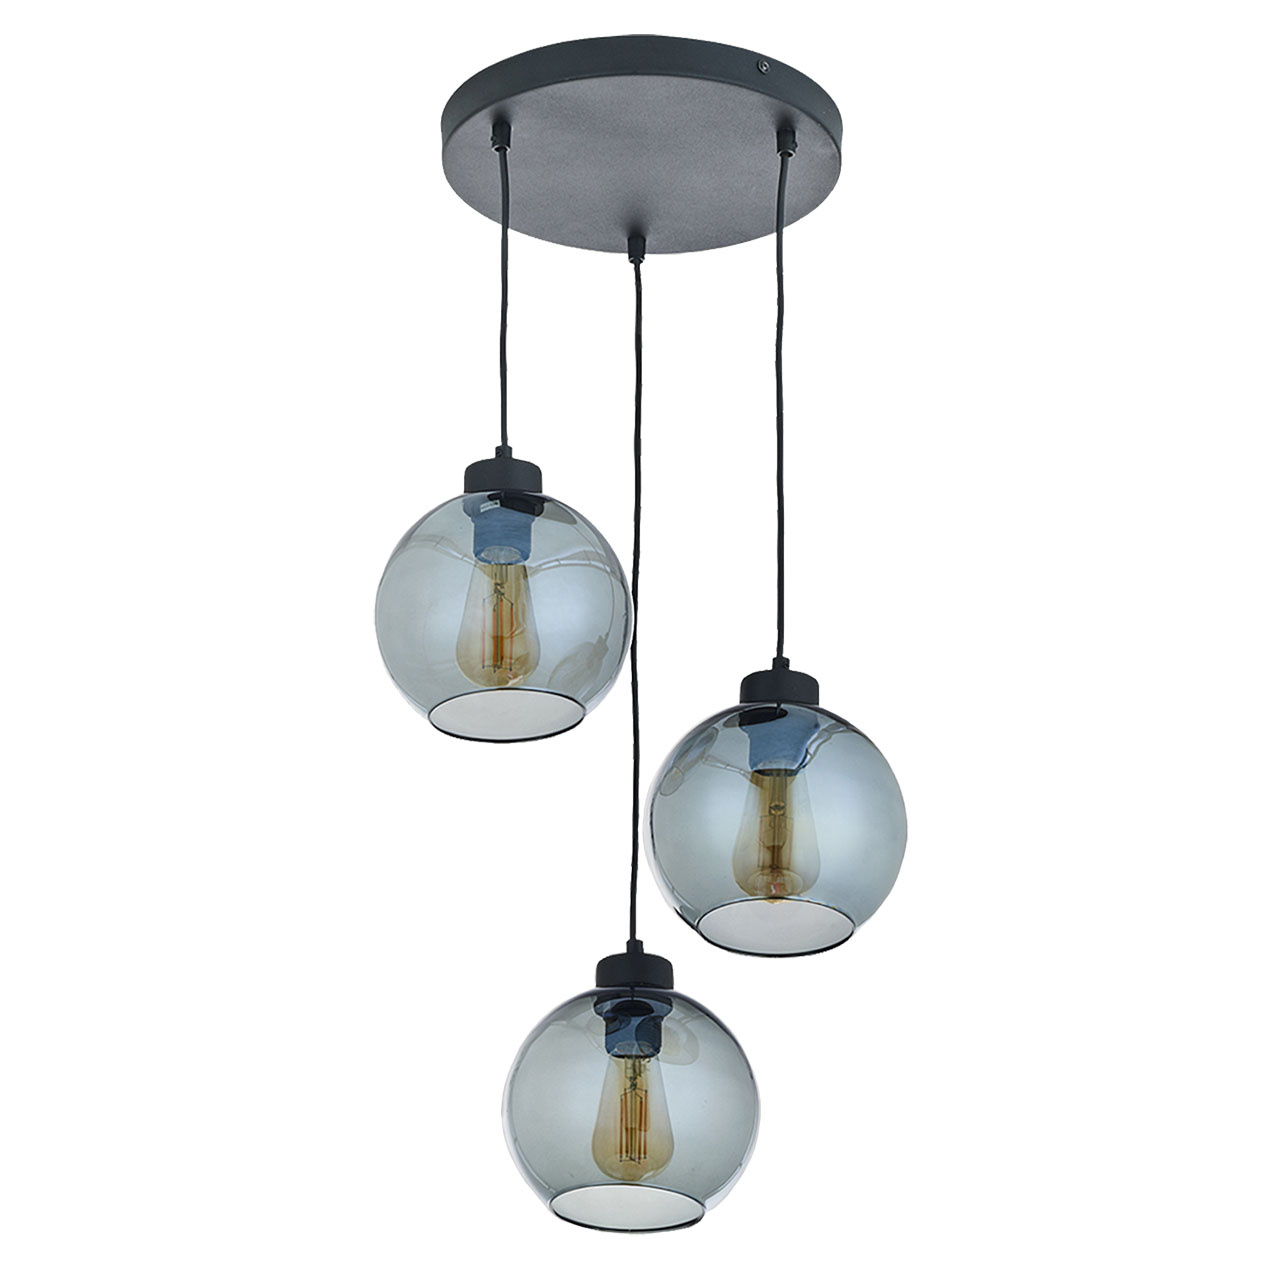 цена на Светильник TK Lighting 2612 Cubus Graphite Cubus Graphite